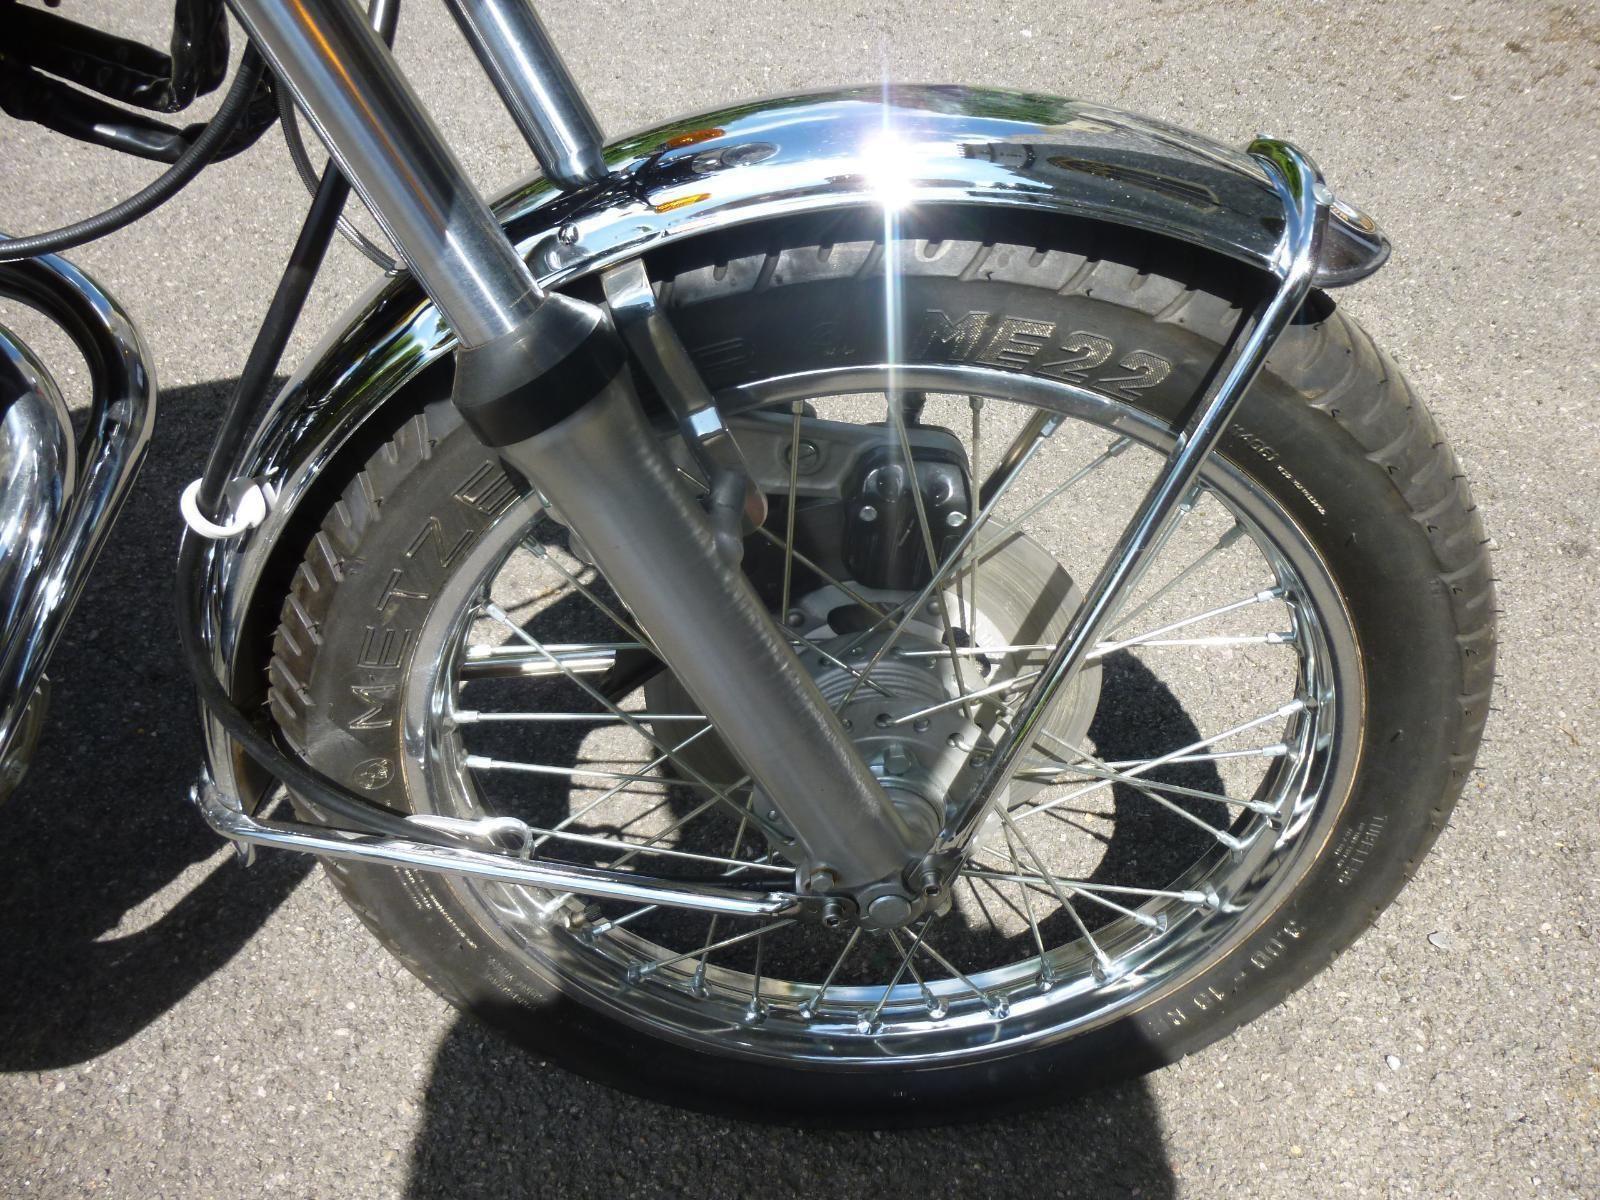 Honda CB400/4 - 1976 - Front Forks, Front Wheel, Front Mudguard, and Brake.